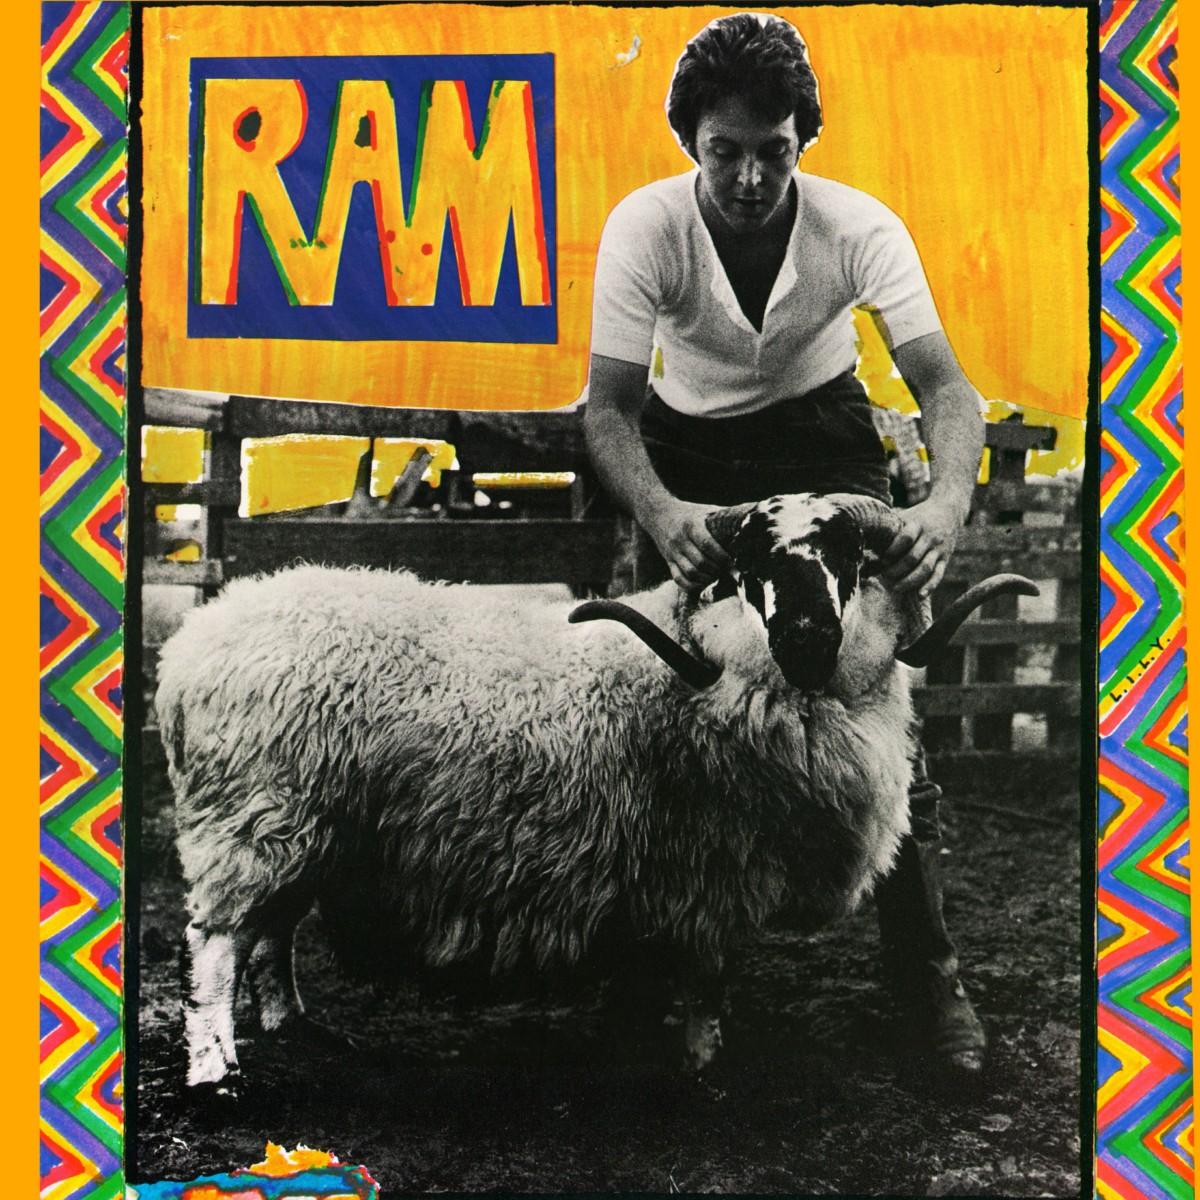 Paul, Ram On!